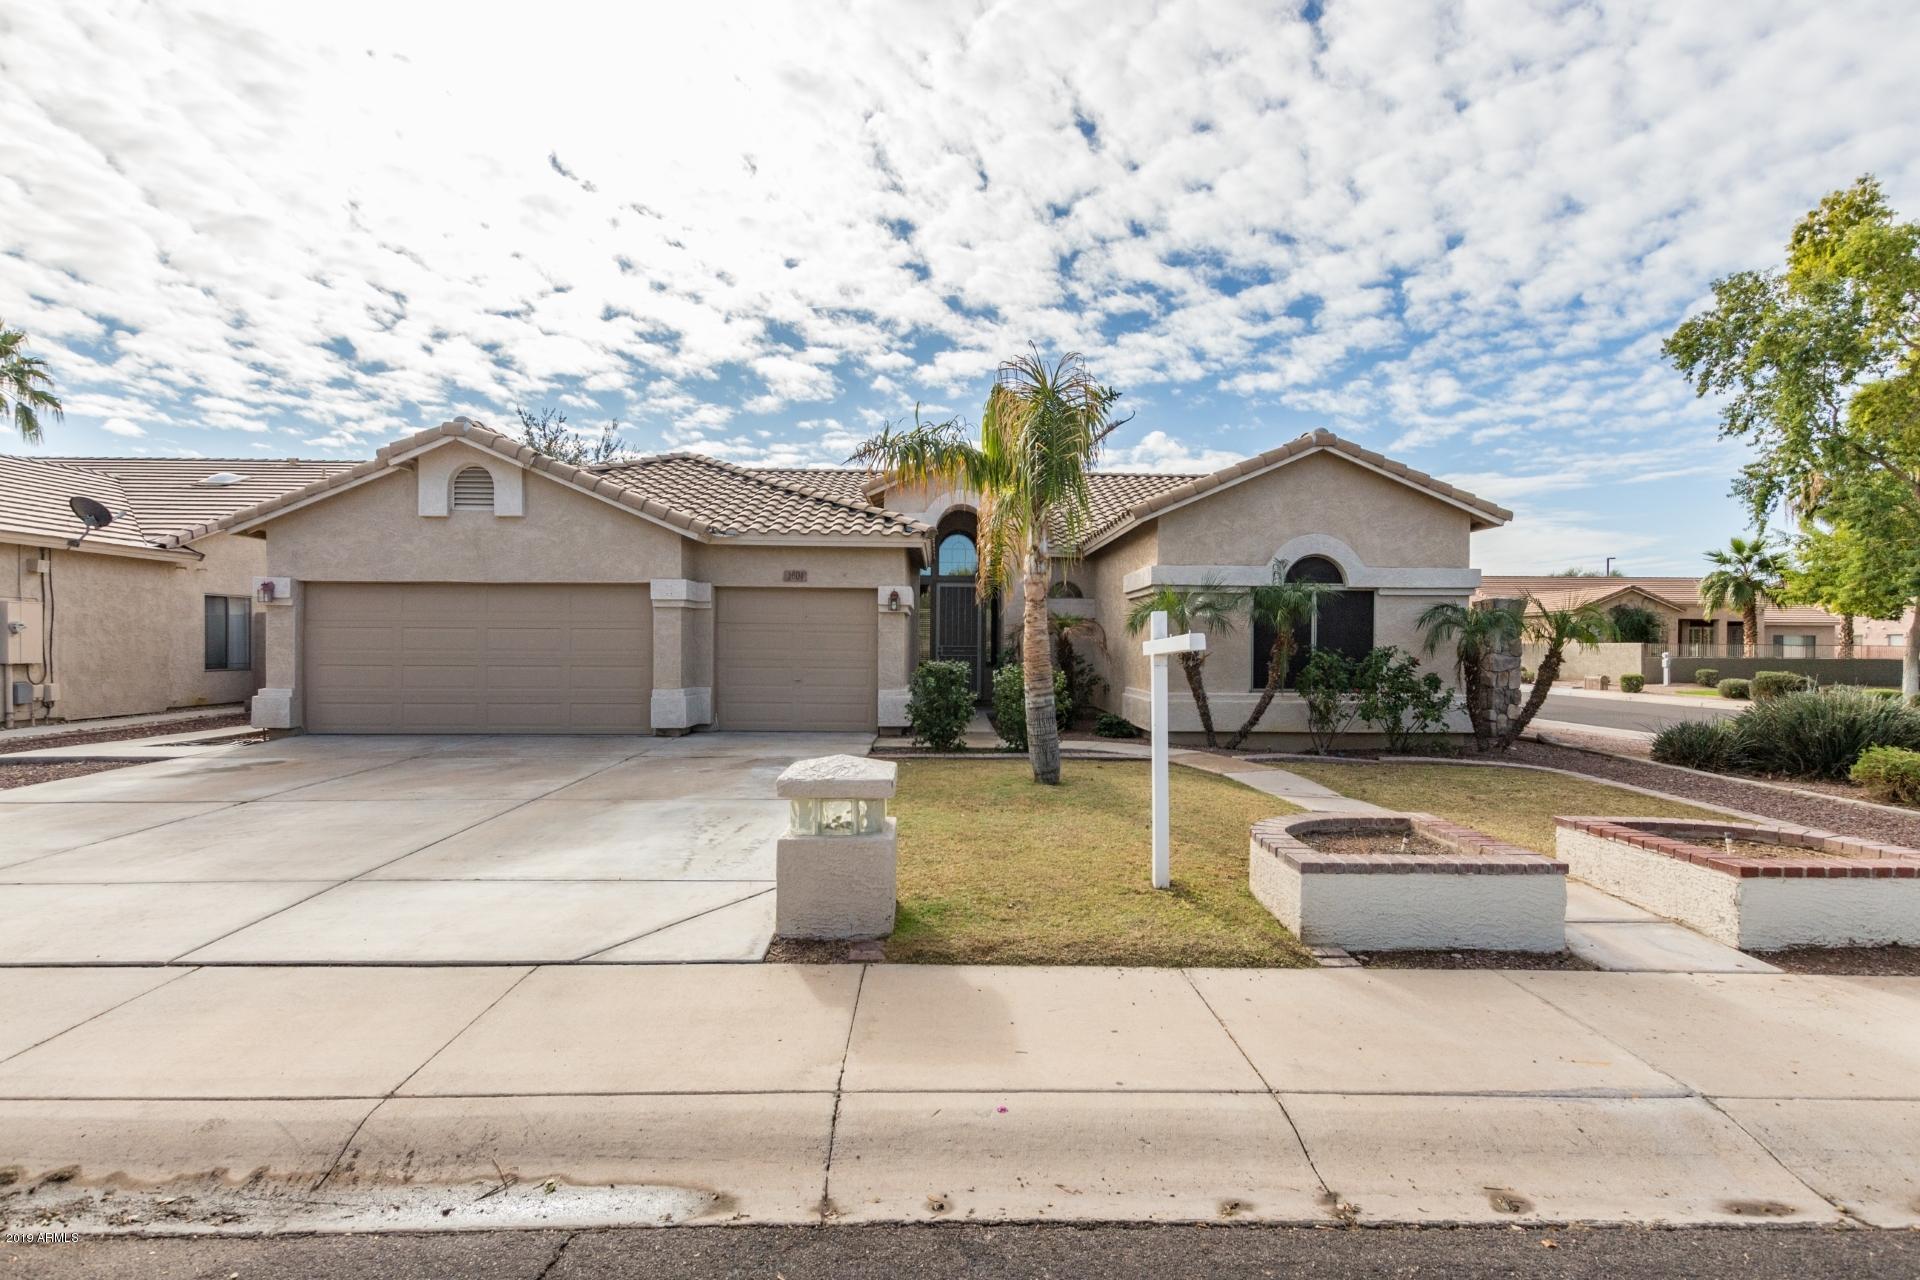 Photo of 2601 E HARWELL Road, Gilbert, AZ 85234